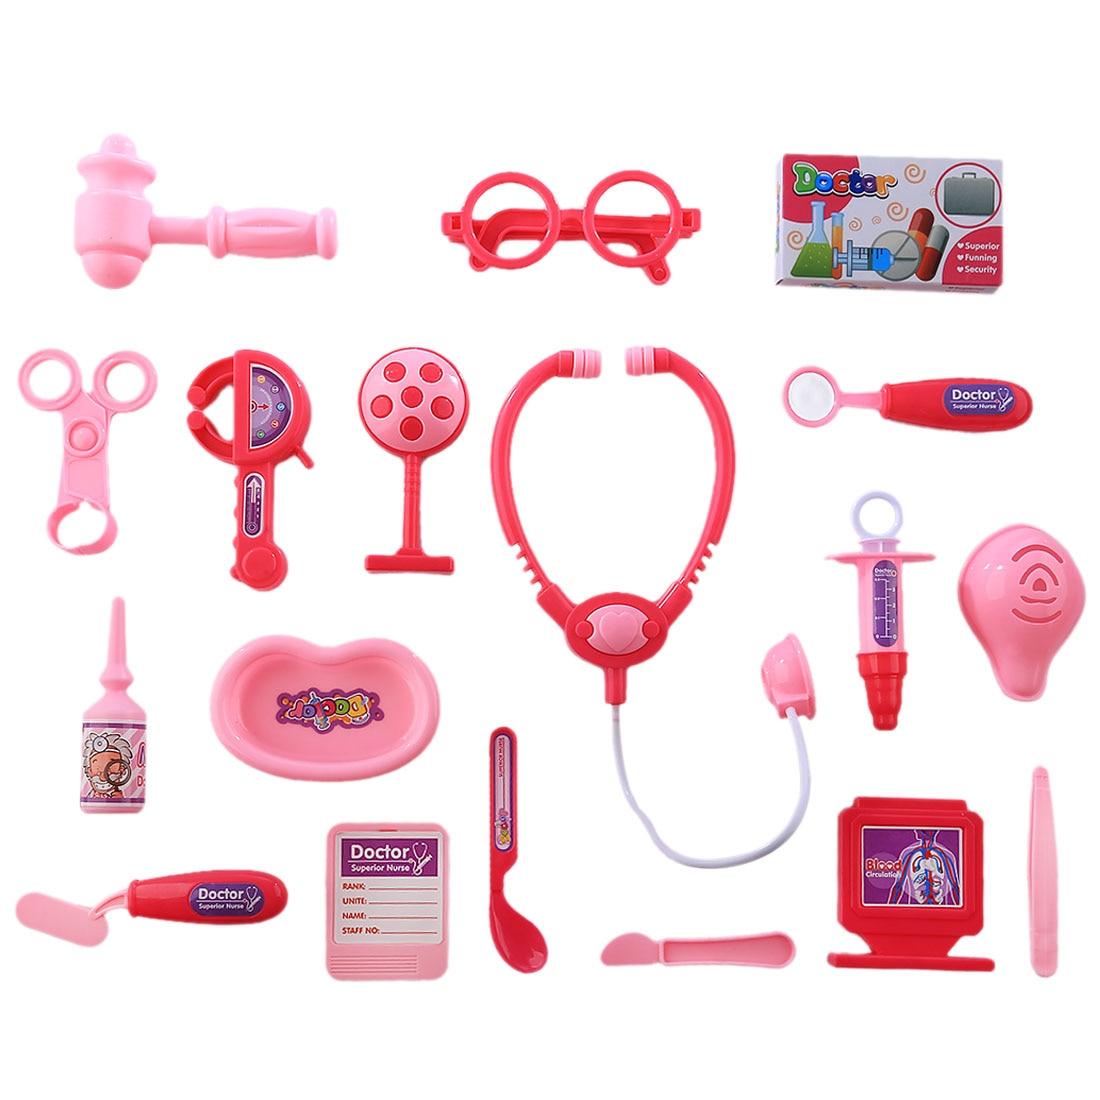 20 Pcs/Set Oval Shape Doctor Kit Storage Box Medical ...